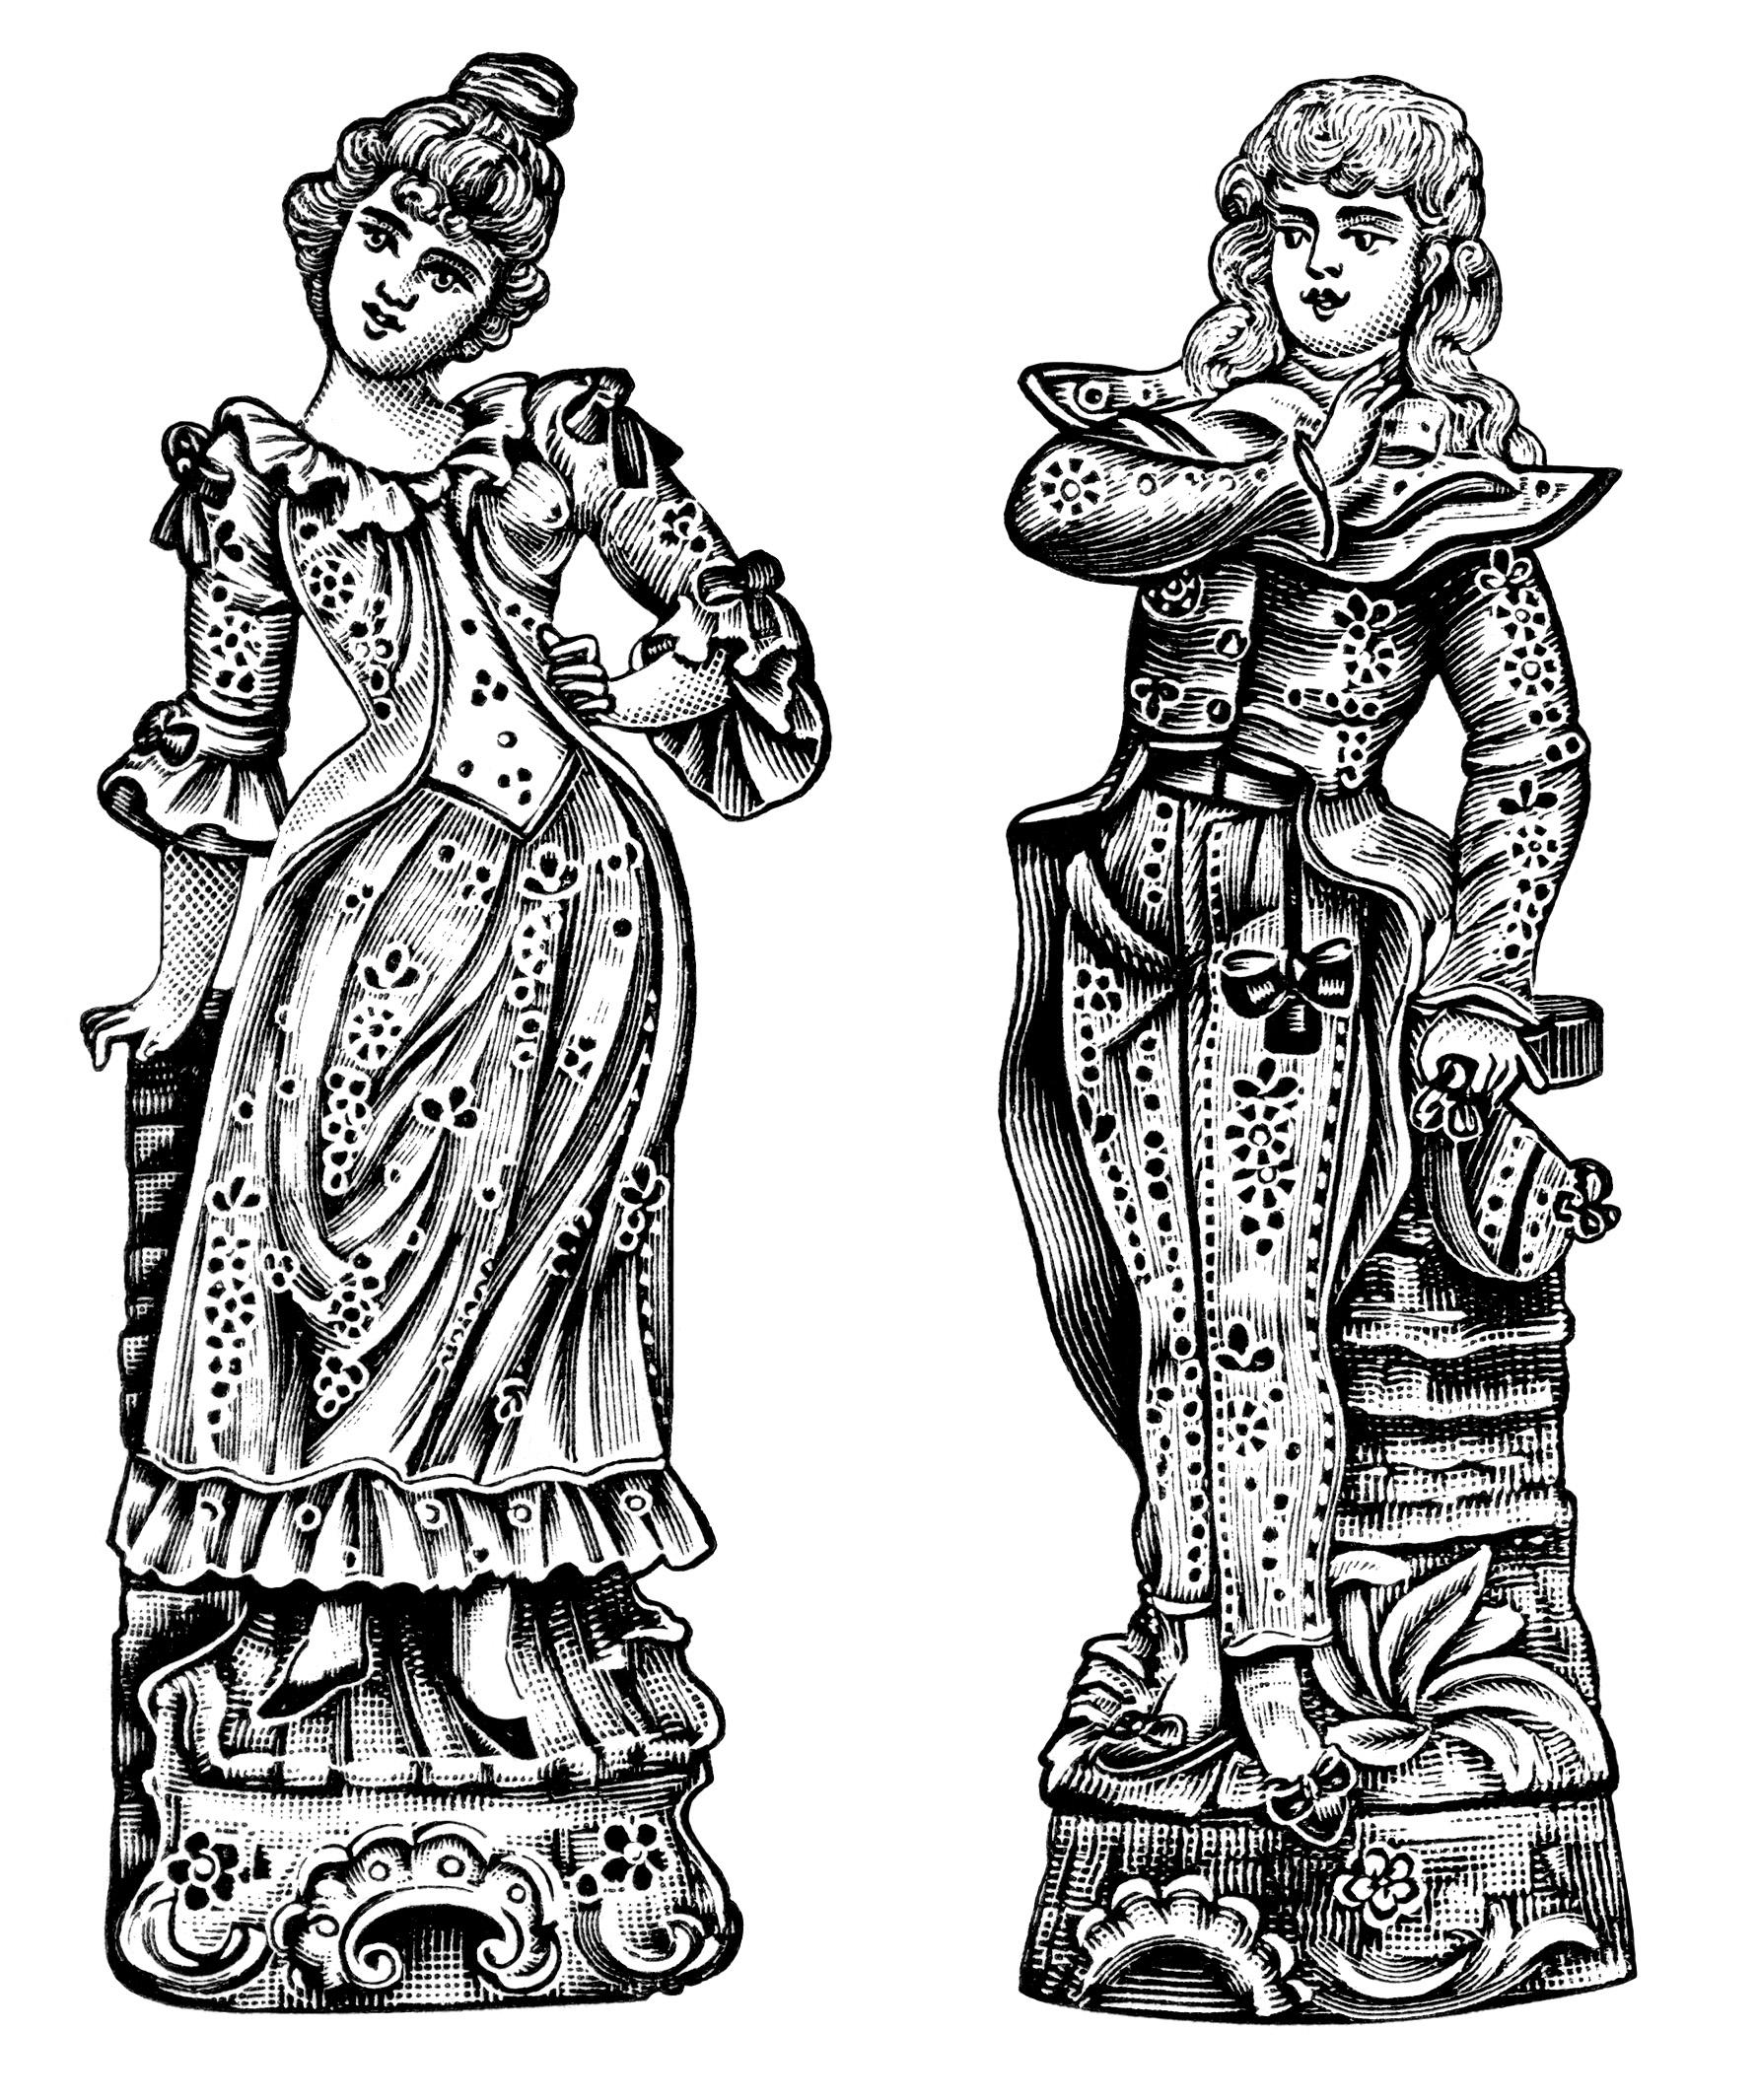 Victorian clip art, antique bisque figure, black and white graphics free, vintage man and woman clip art, Victorian couple illustration